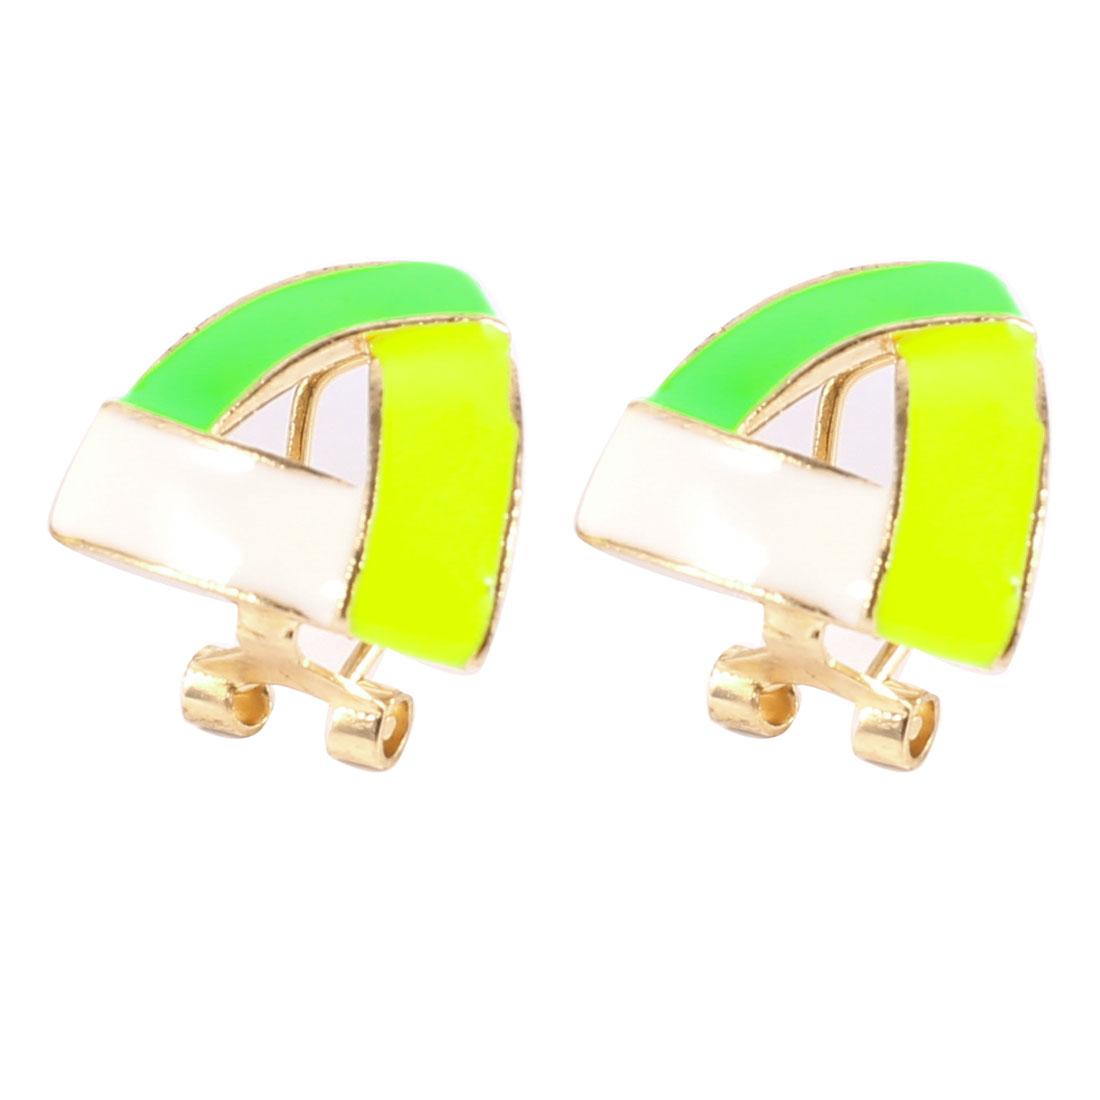 Gold Tone Triangular Shaped Mini French Clip Earrings